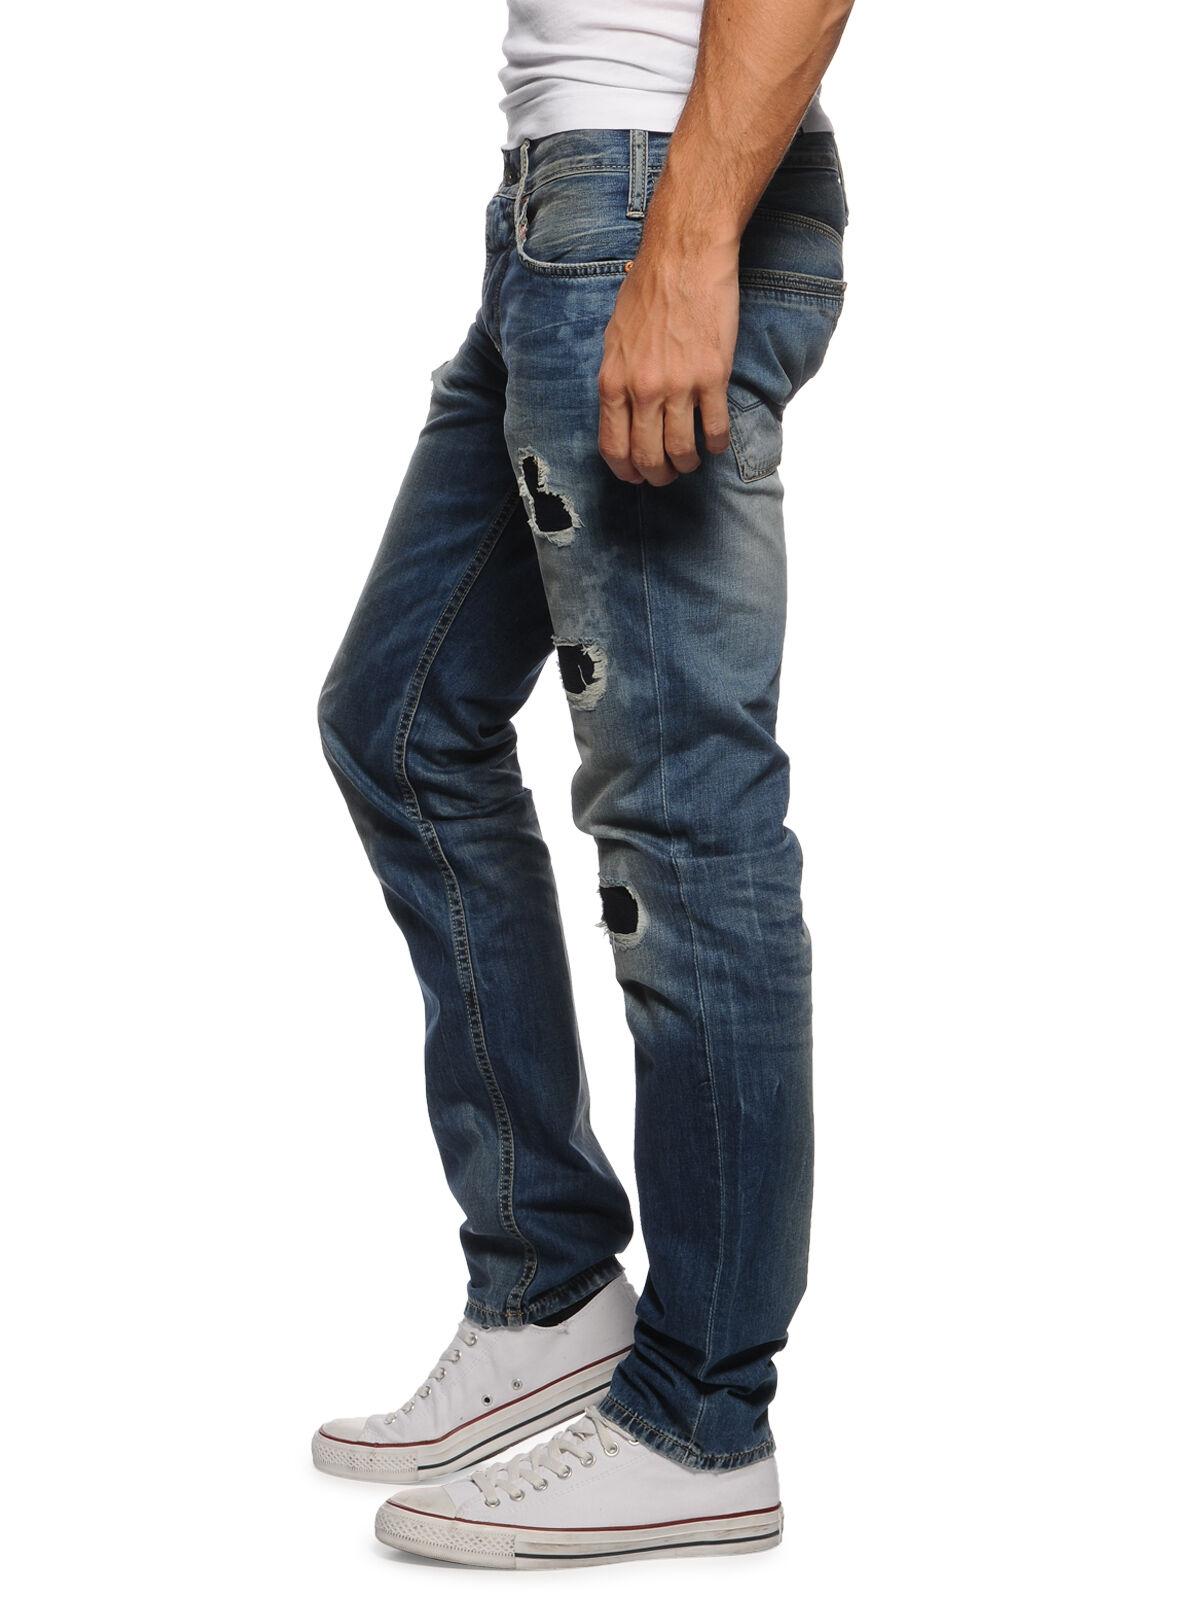 Ledger Jeans